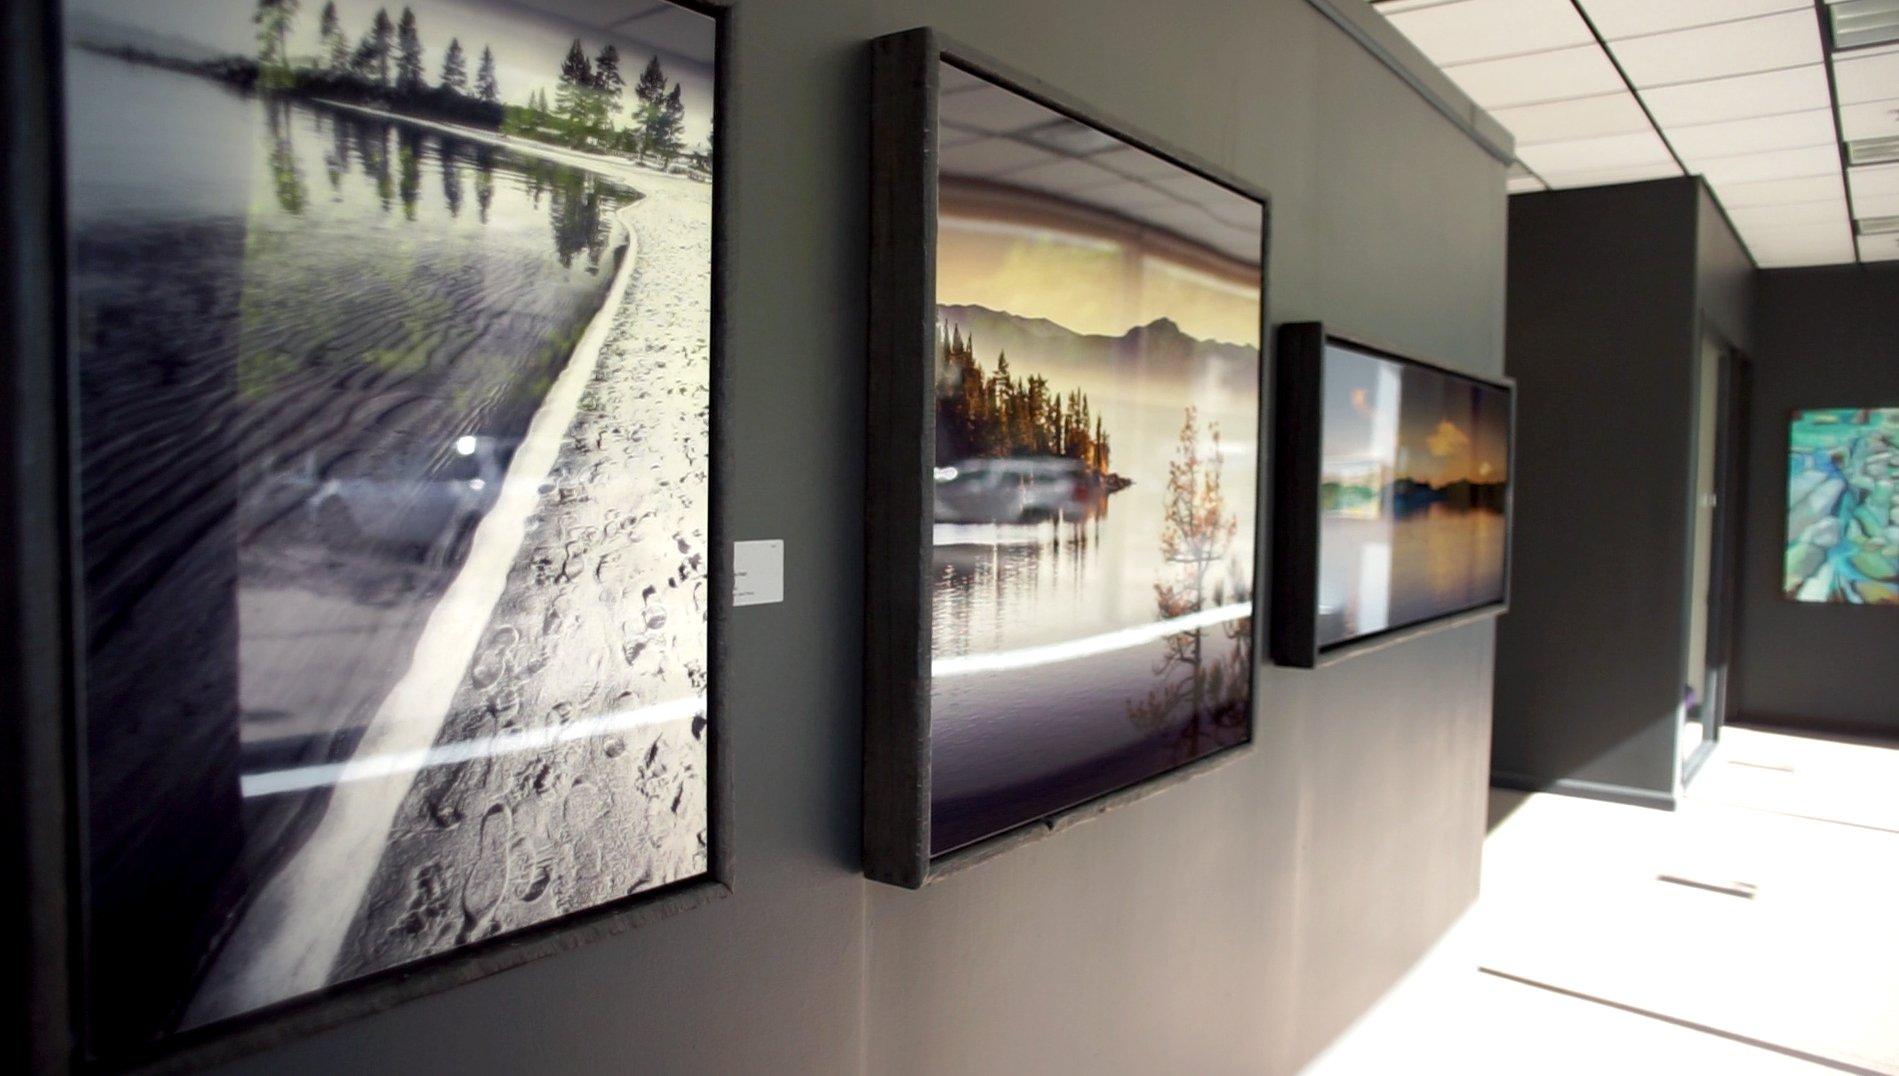 Exhibitions by Maz Mahjoobi - Tahoe Metal Prints in Reclaimed Wood Frames